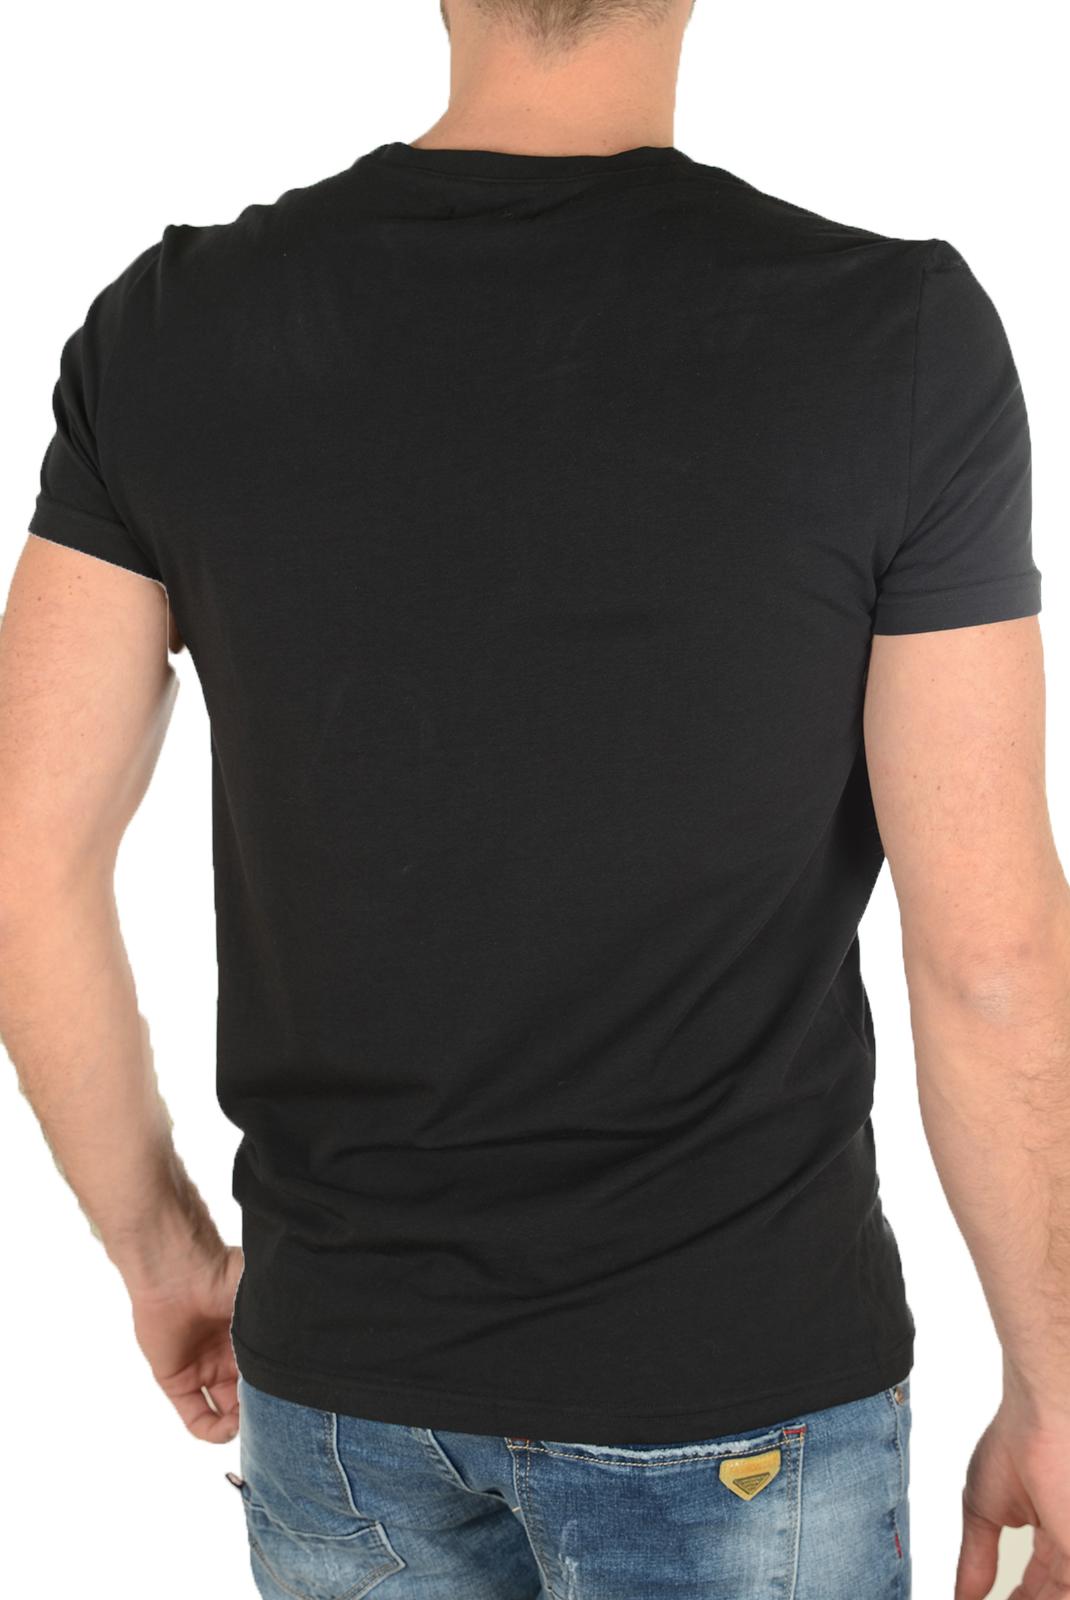 Tee-shirts manches courtes  Emporio armani 110853 6P510 20